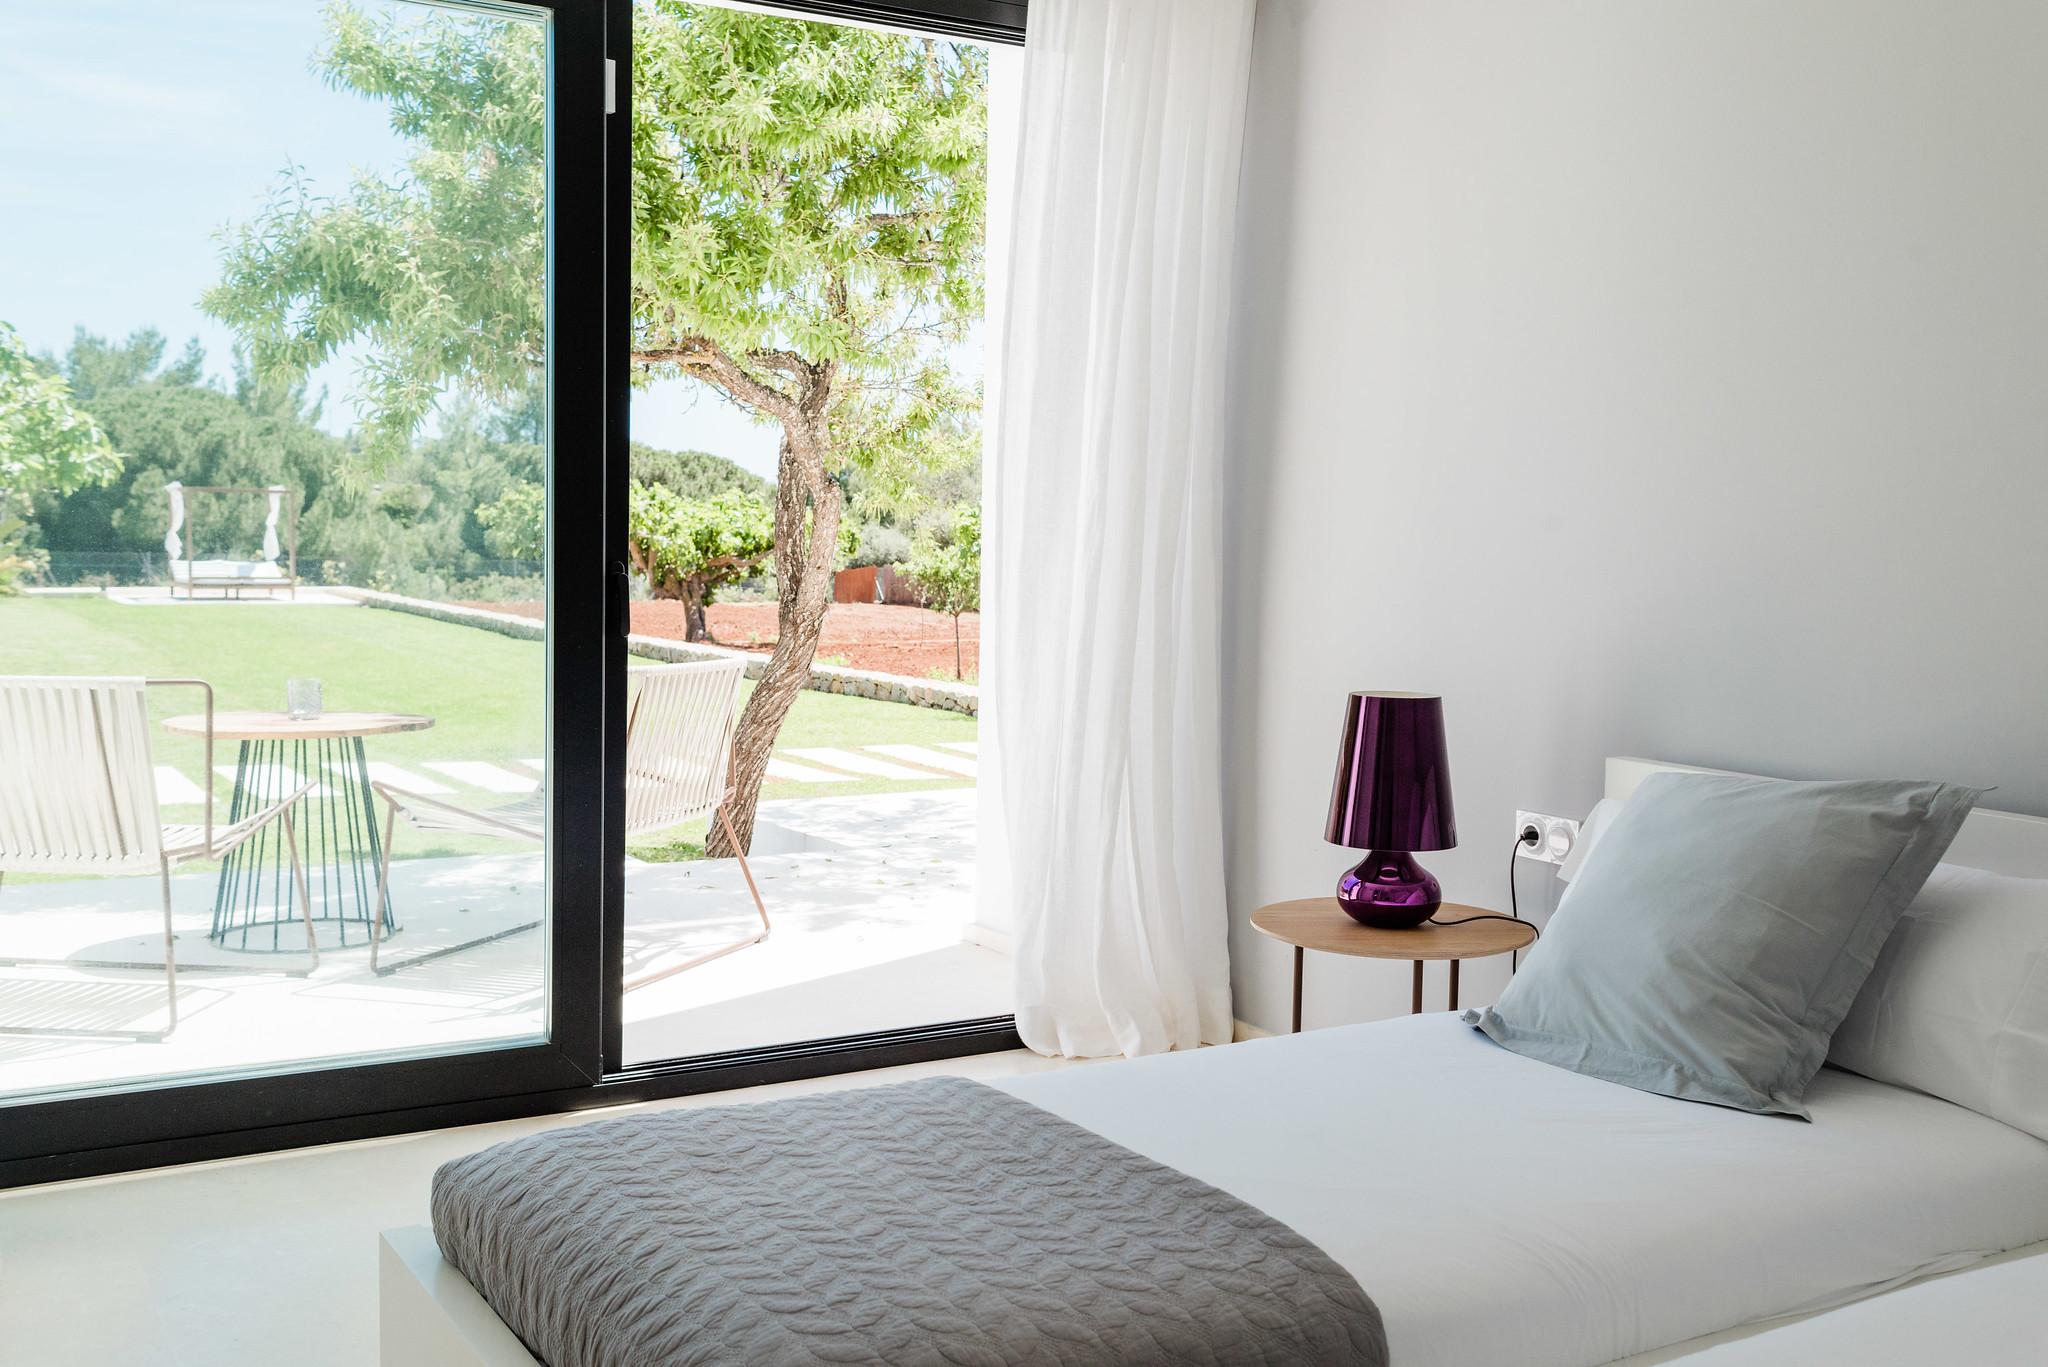 https://www.white-ibiza.com/wp-content/uploads/2020/06/white-ibiza-villas-can-carmen-interior-bedroom4.jpg